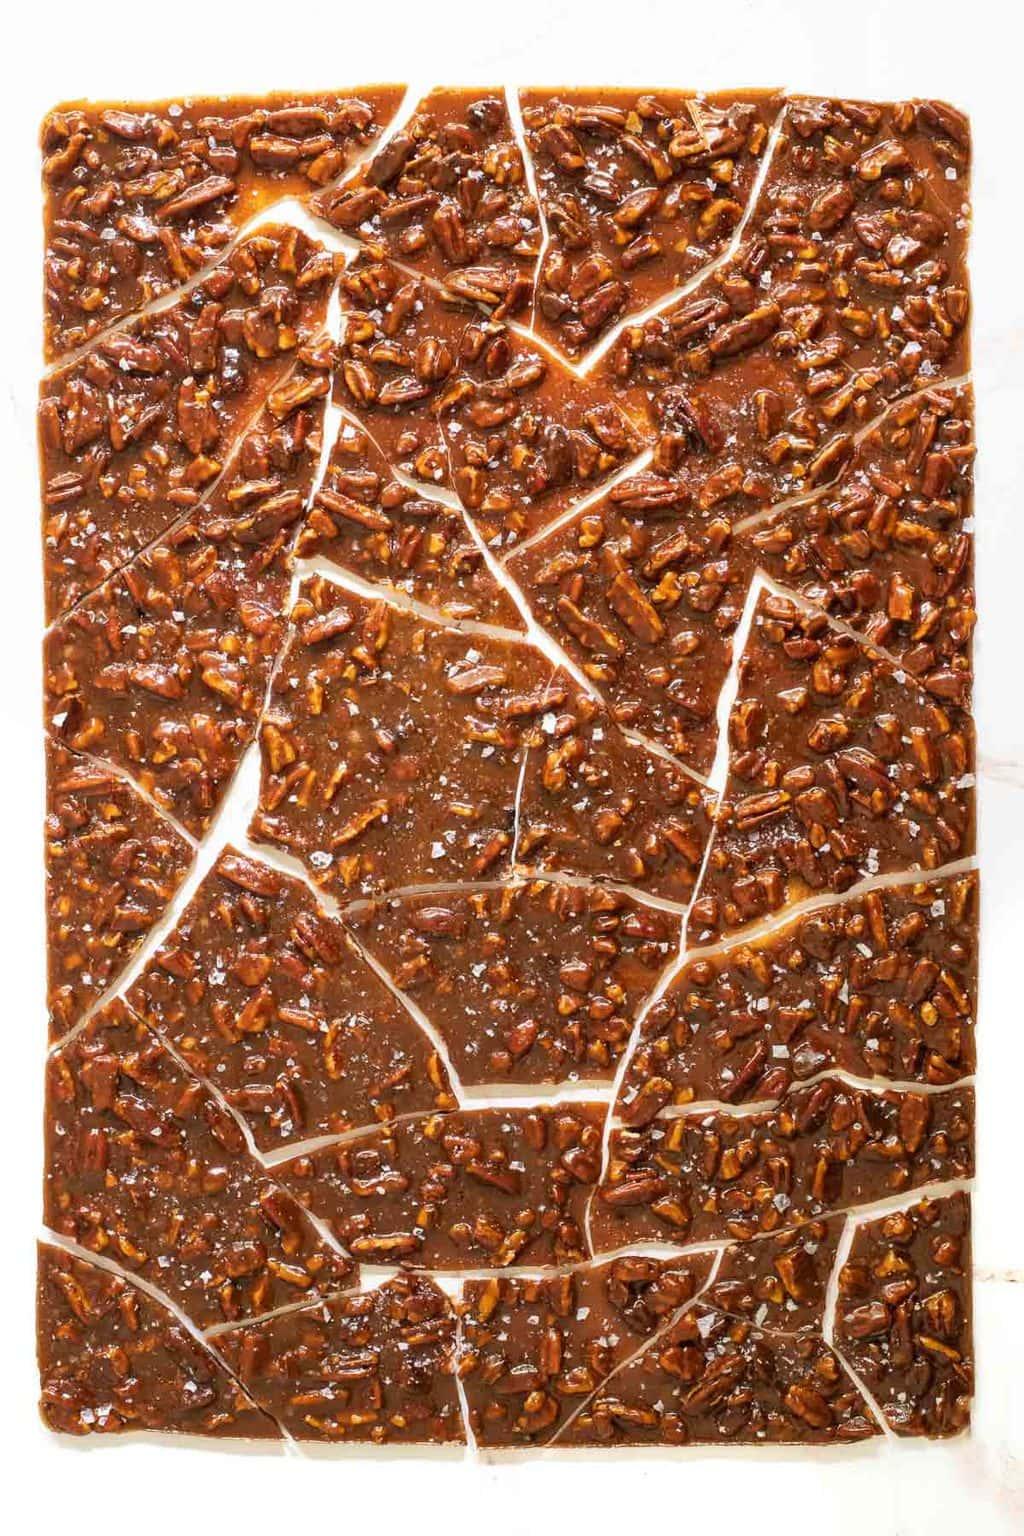 Vertical overhead photo of a baking sheet full of Sea Salted Pumpkin Pecan Brittle broken into pieces.